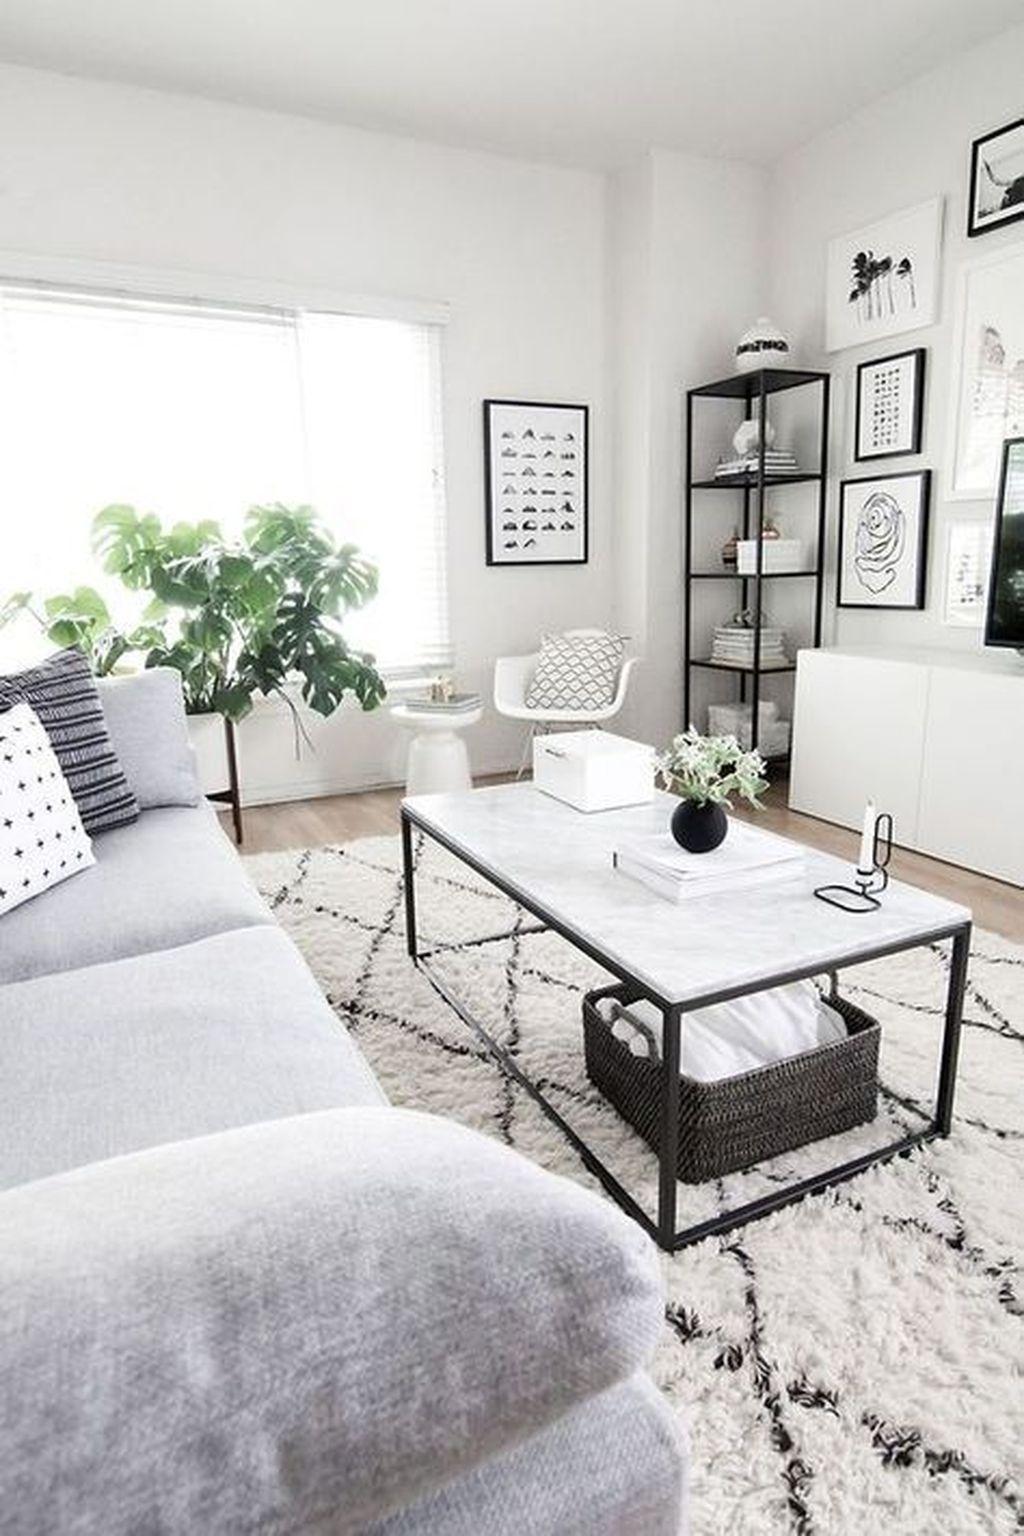 60 Space Saving Small Studio Decoration Ideas | Small studio ...